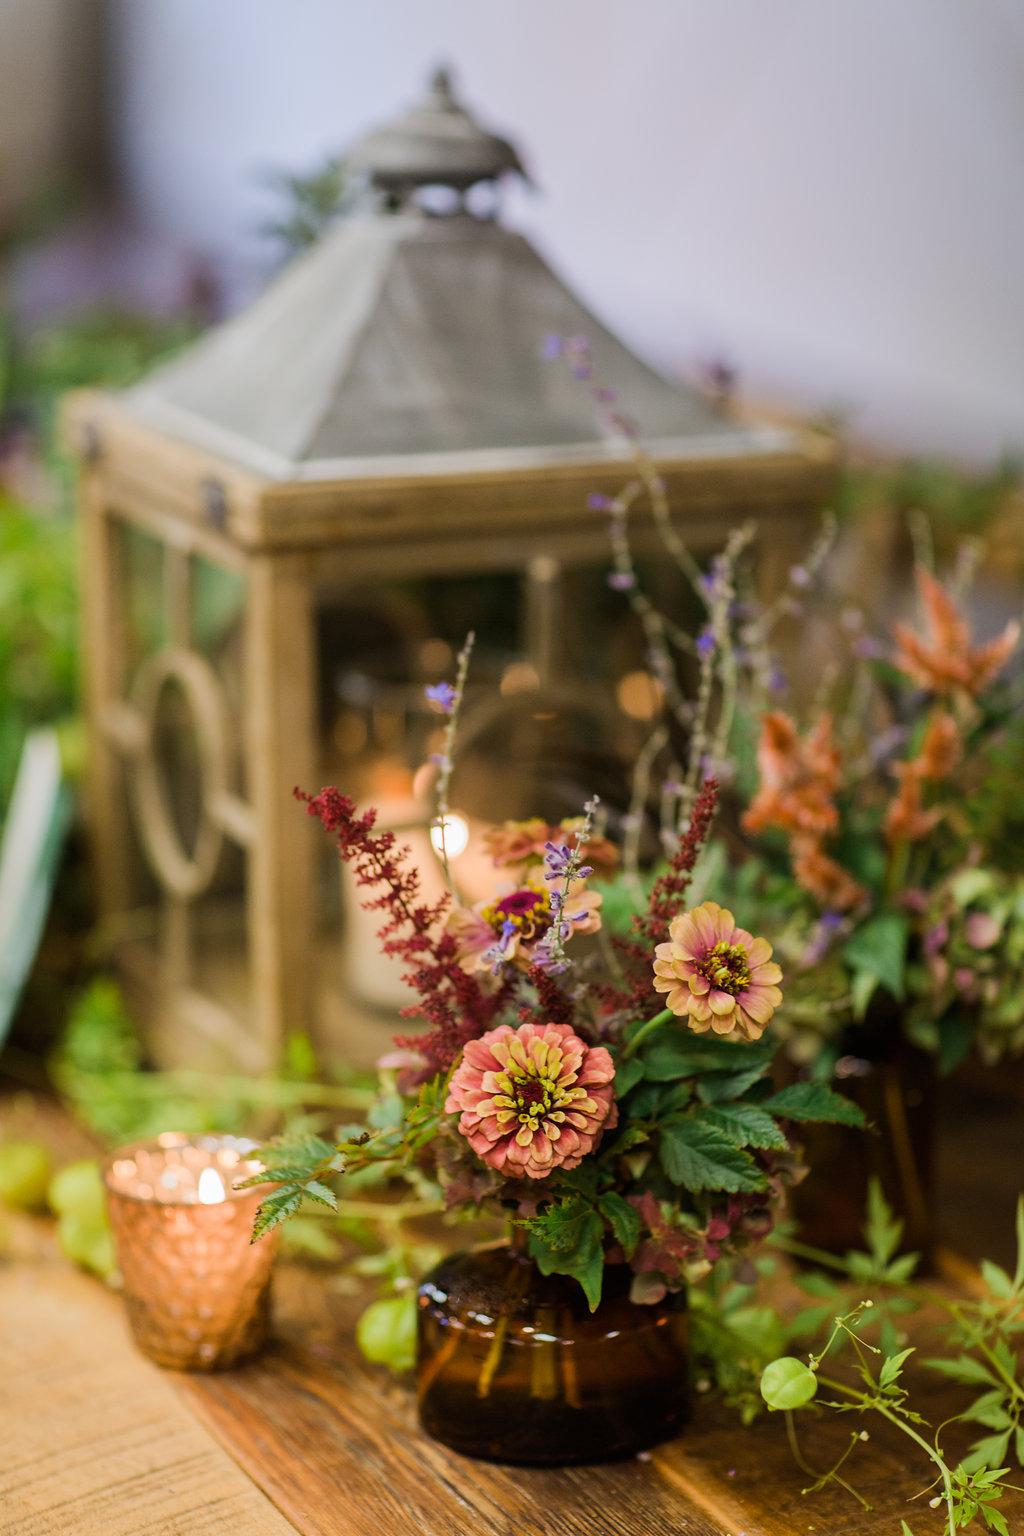 woodland inspired wedding with greenery - https://ruffledblog.com/rustic-woodland-chic-wedding-inspiration-in-baltimore